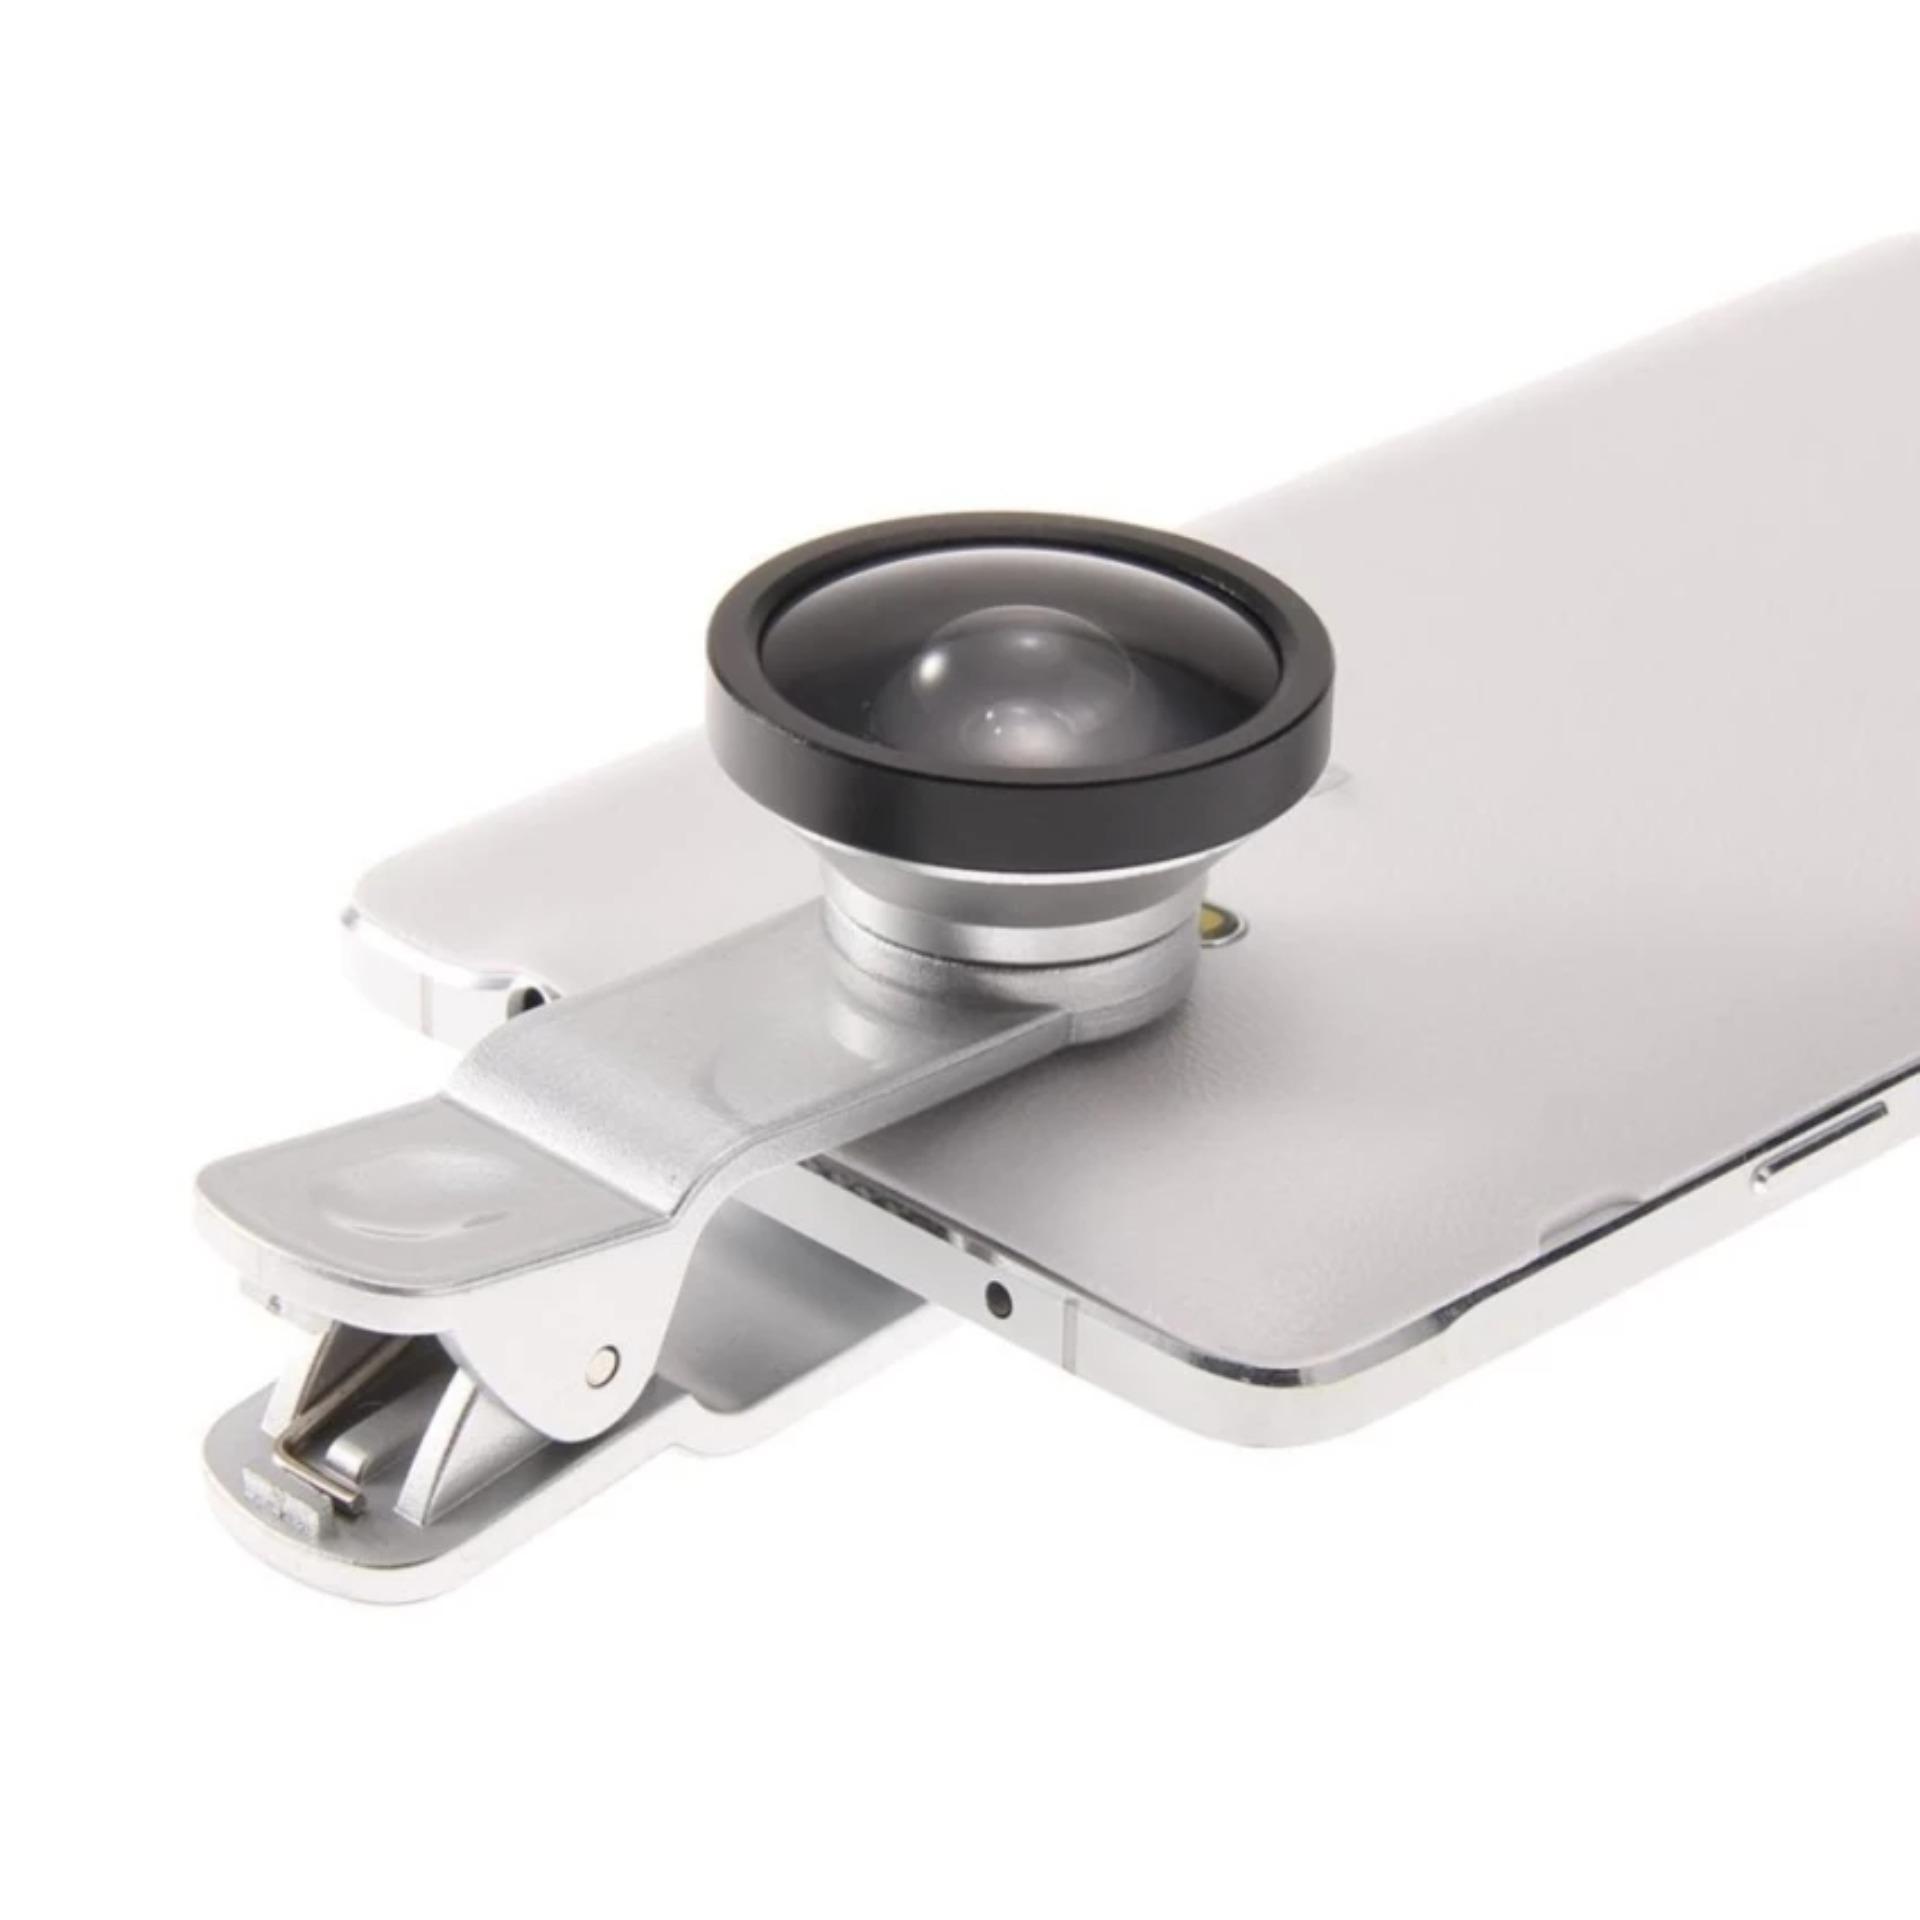 Universal Clip Lens Super Wide 04x U004 235 Daftar Harga Terbaru Lensa Superwide Degree With 0 4x Selfie Cam Silver